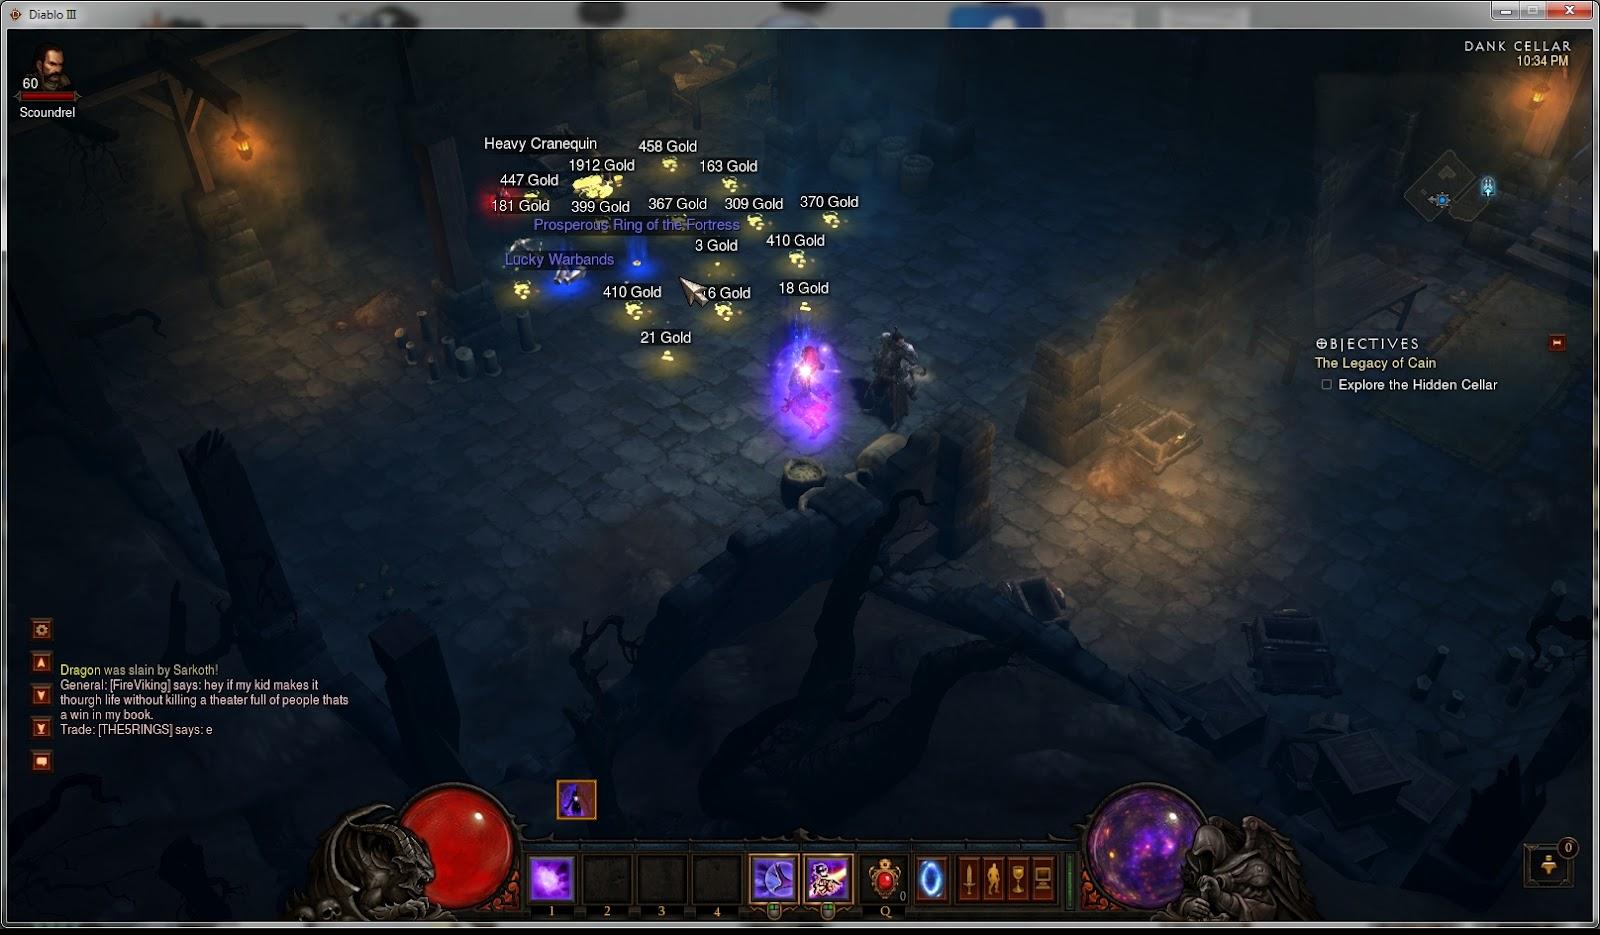 Diablo AFK Bots: Diablo 3 easy gold and item farming routes